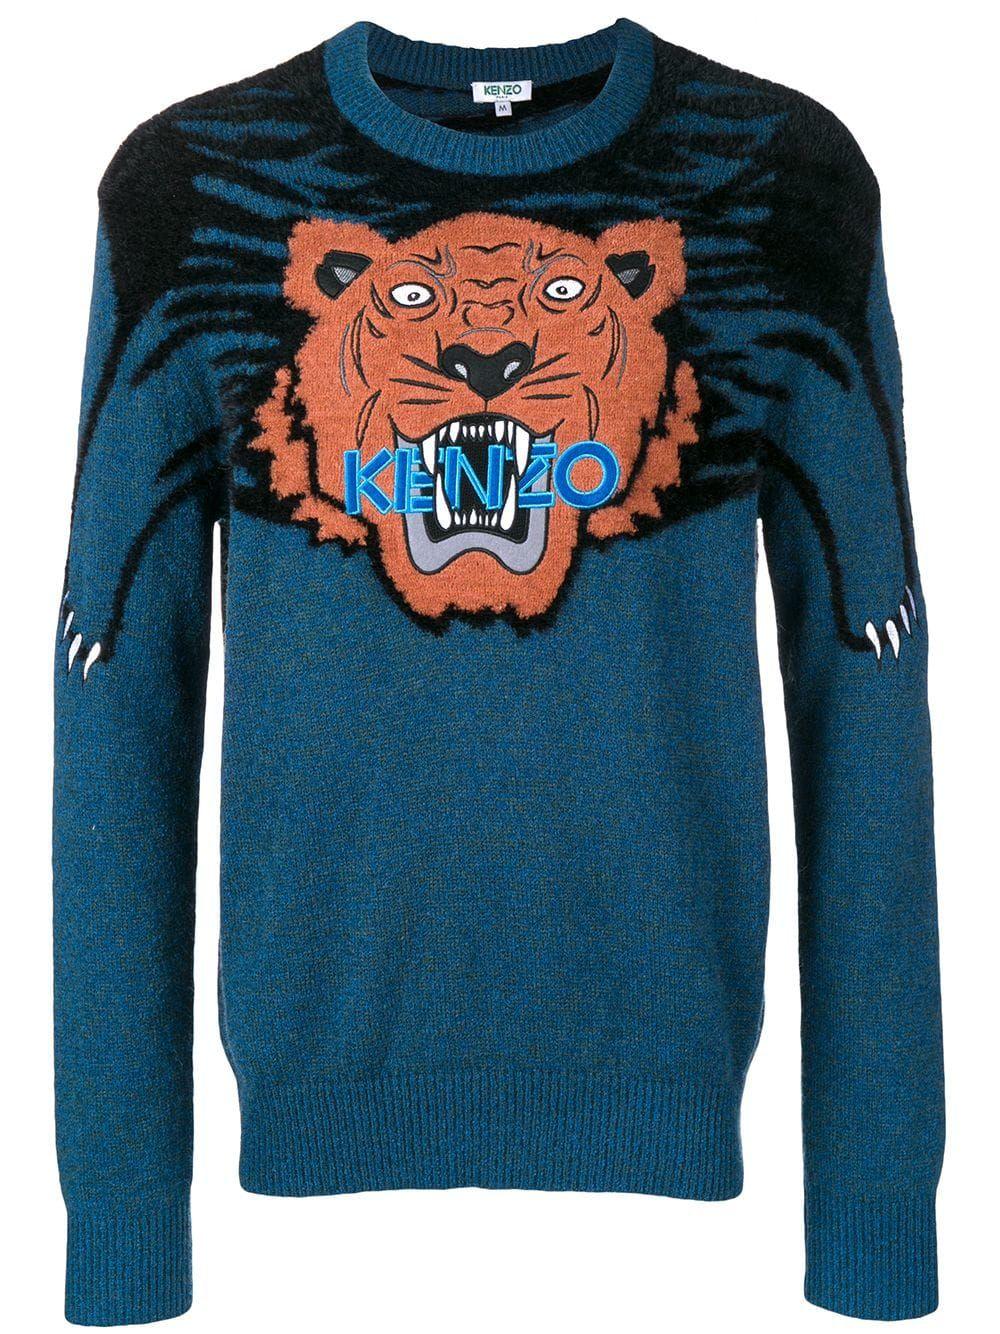 0630a5312 KENZO KENZO LARGE TIGER INTARSIA JUMPER - BLUE. #kenzo #cloth ...